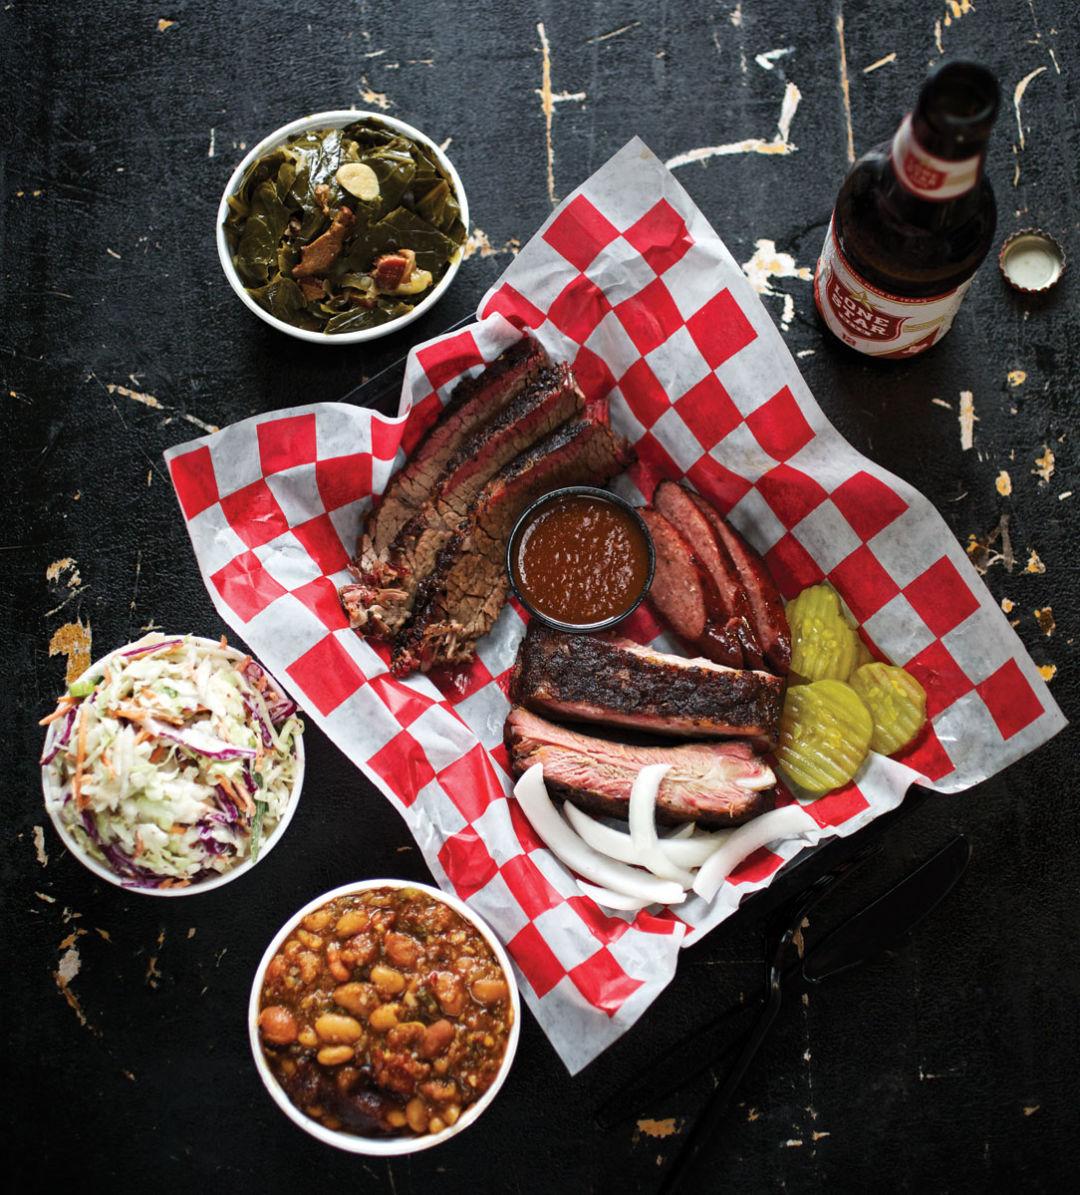 0815 barbecue jackson street texas trinity mu0hmh